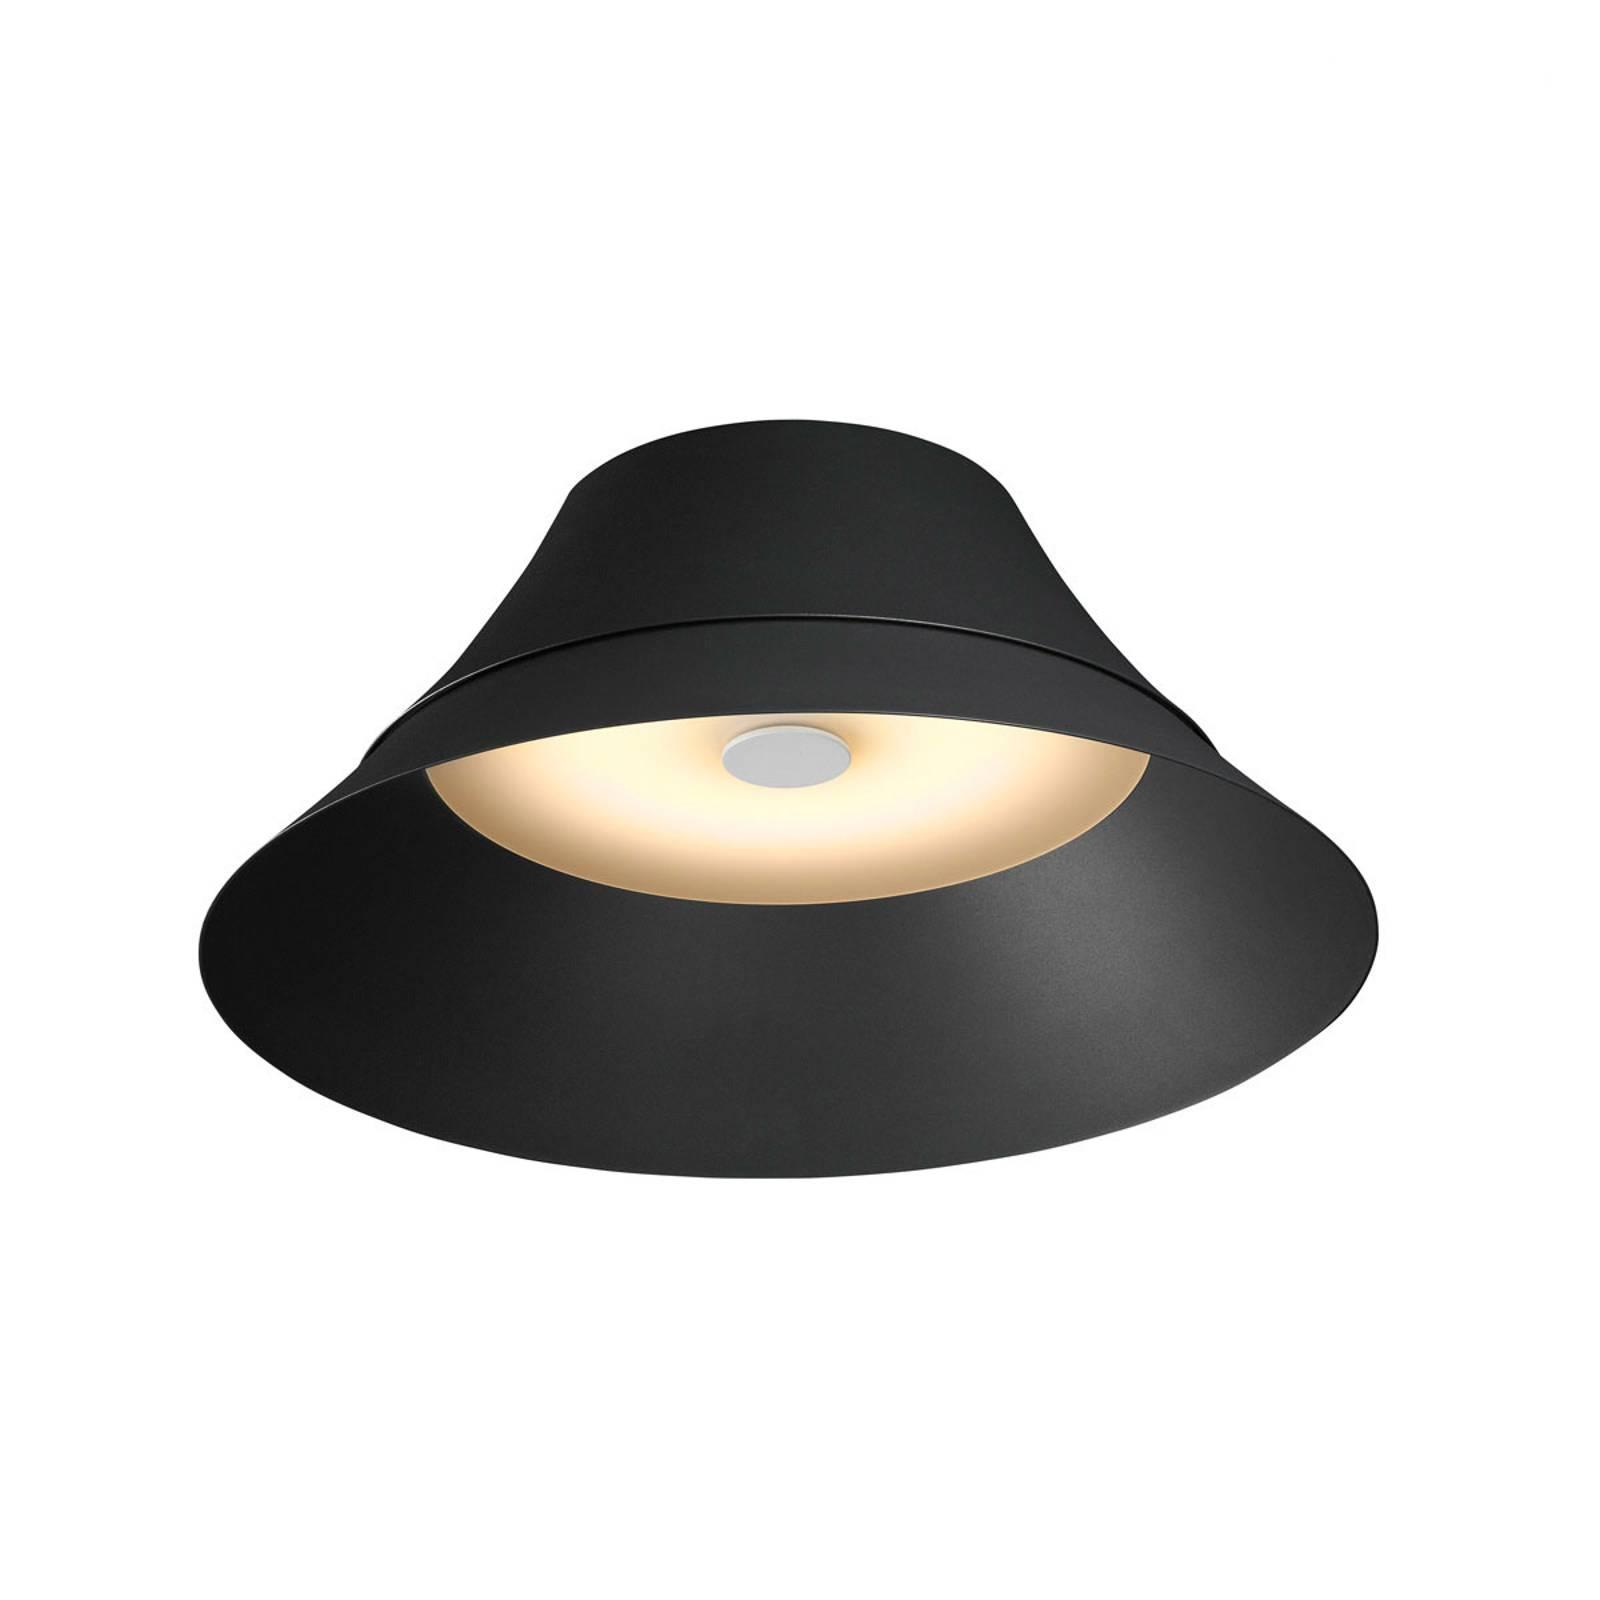 SLV Bato 45 -LED-kattovalaisin, musta